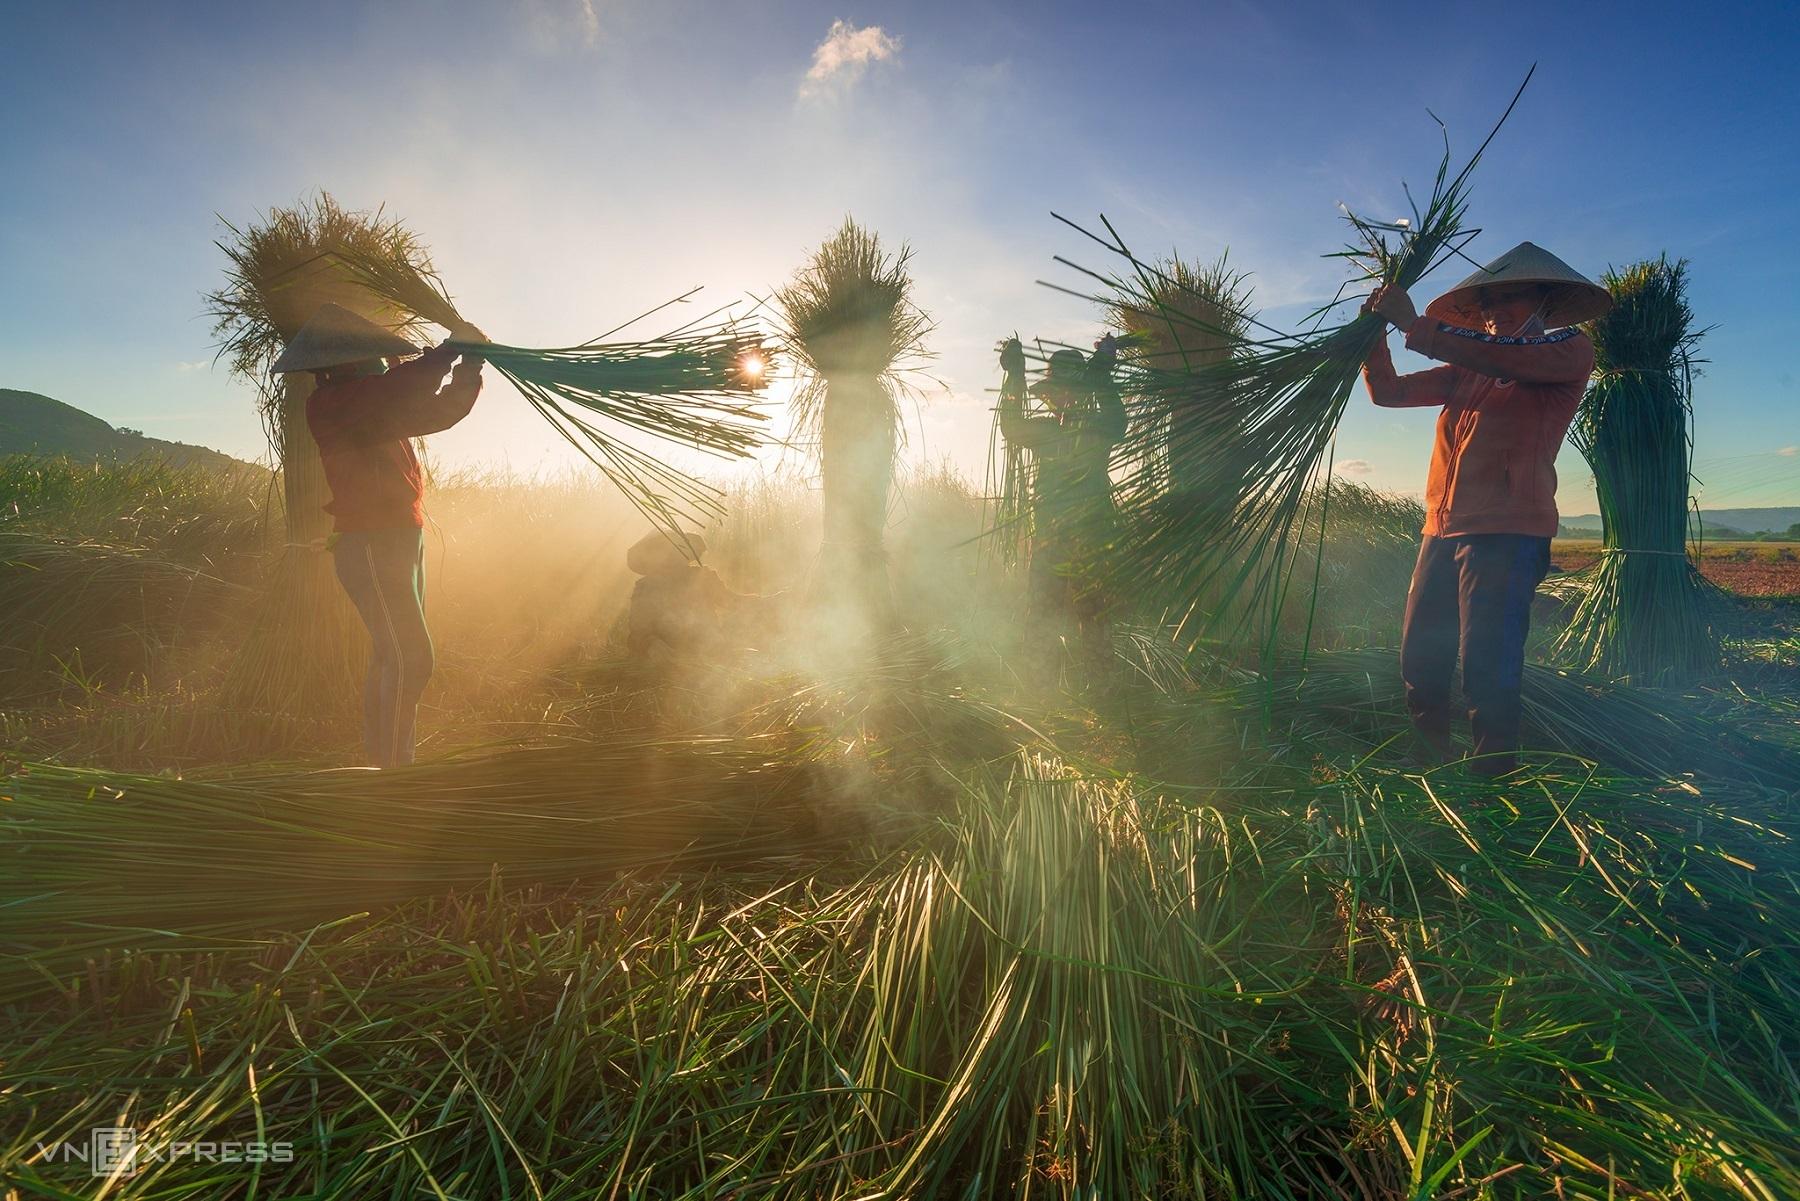 Sedge harvest season in 100-year-old mat village